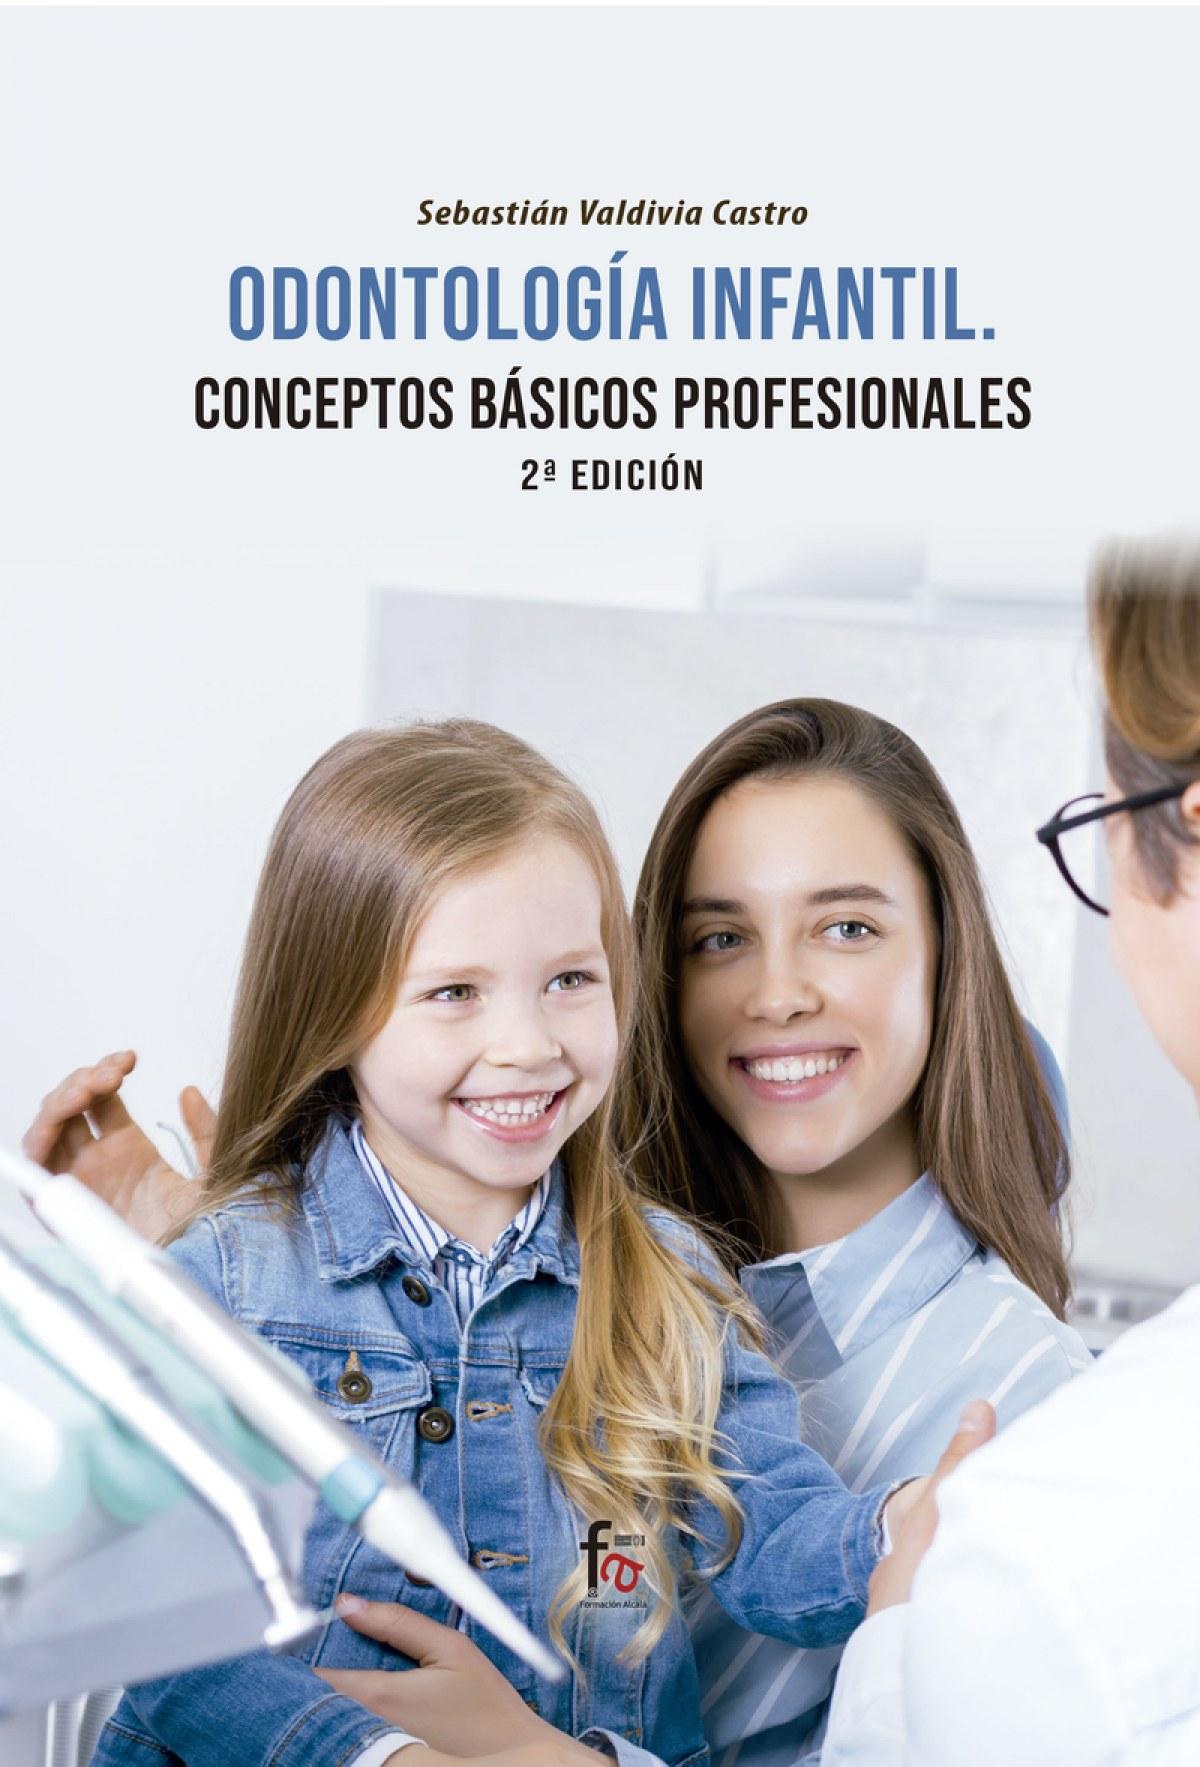 ODONTOLOGIA INFANTIL.CONCEPTOS BASICOS PROFESIONALES 2 ED